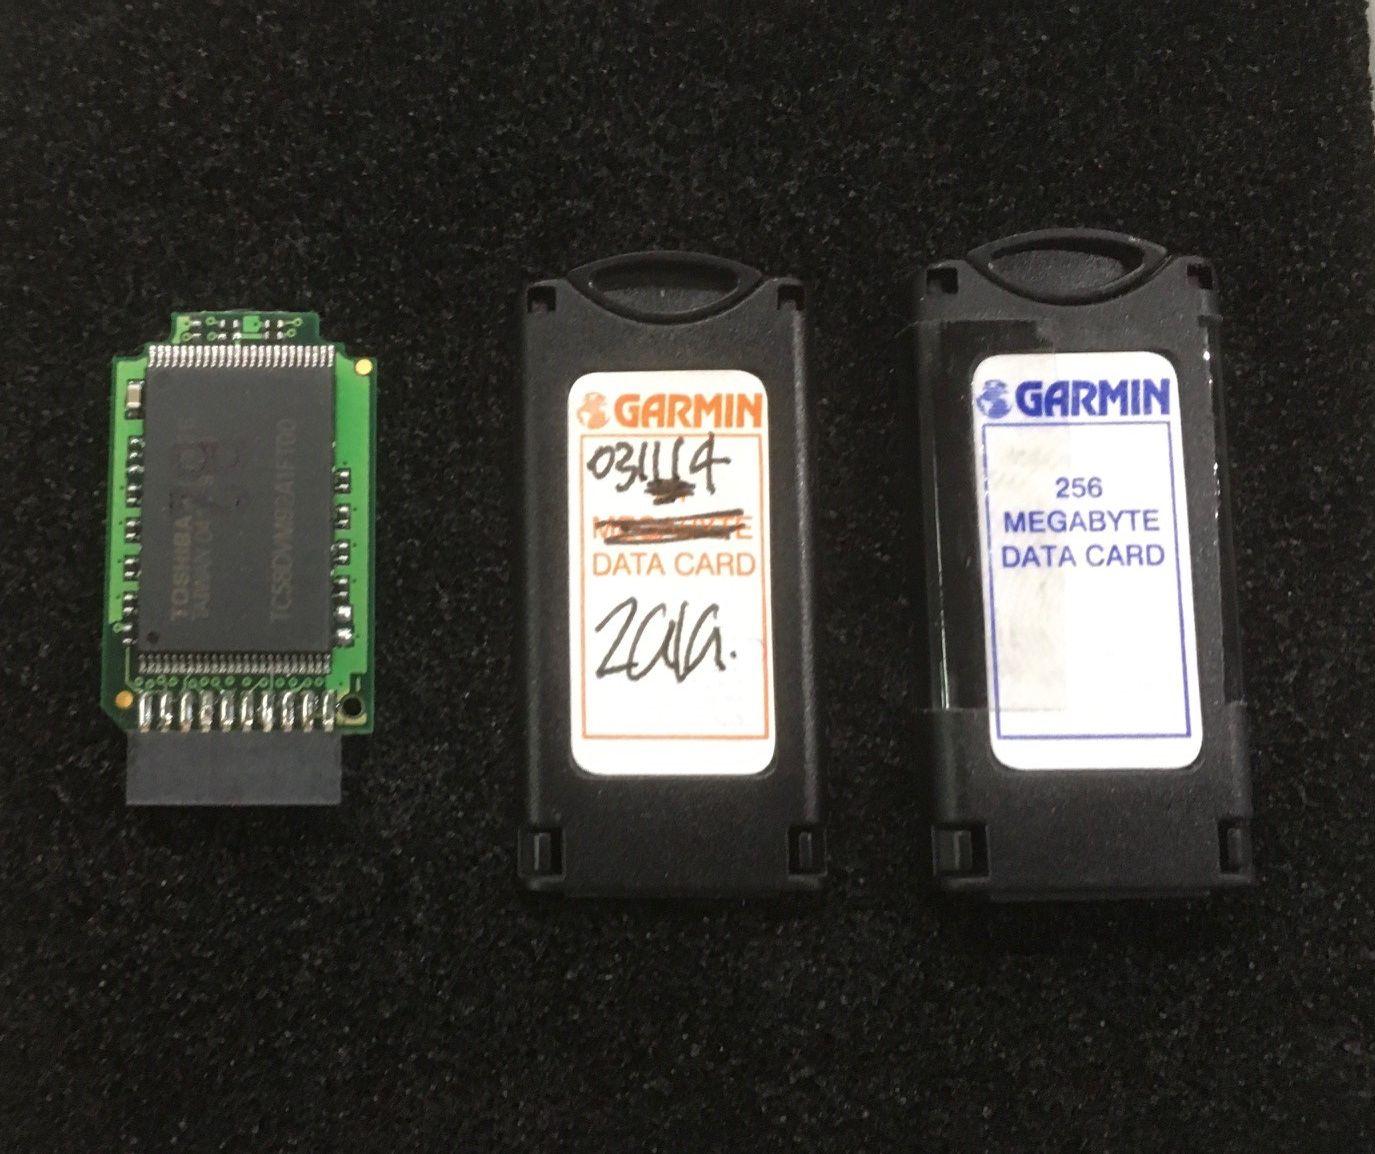 garmin 276c memory cards.jpg